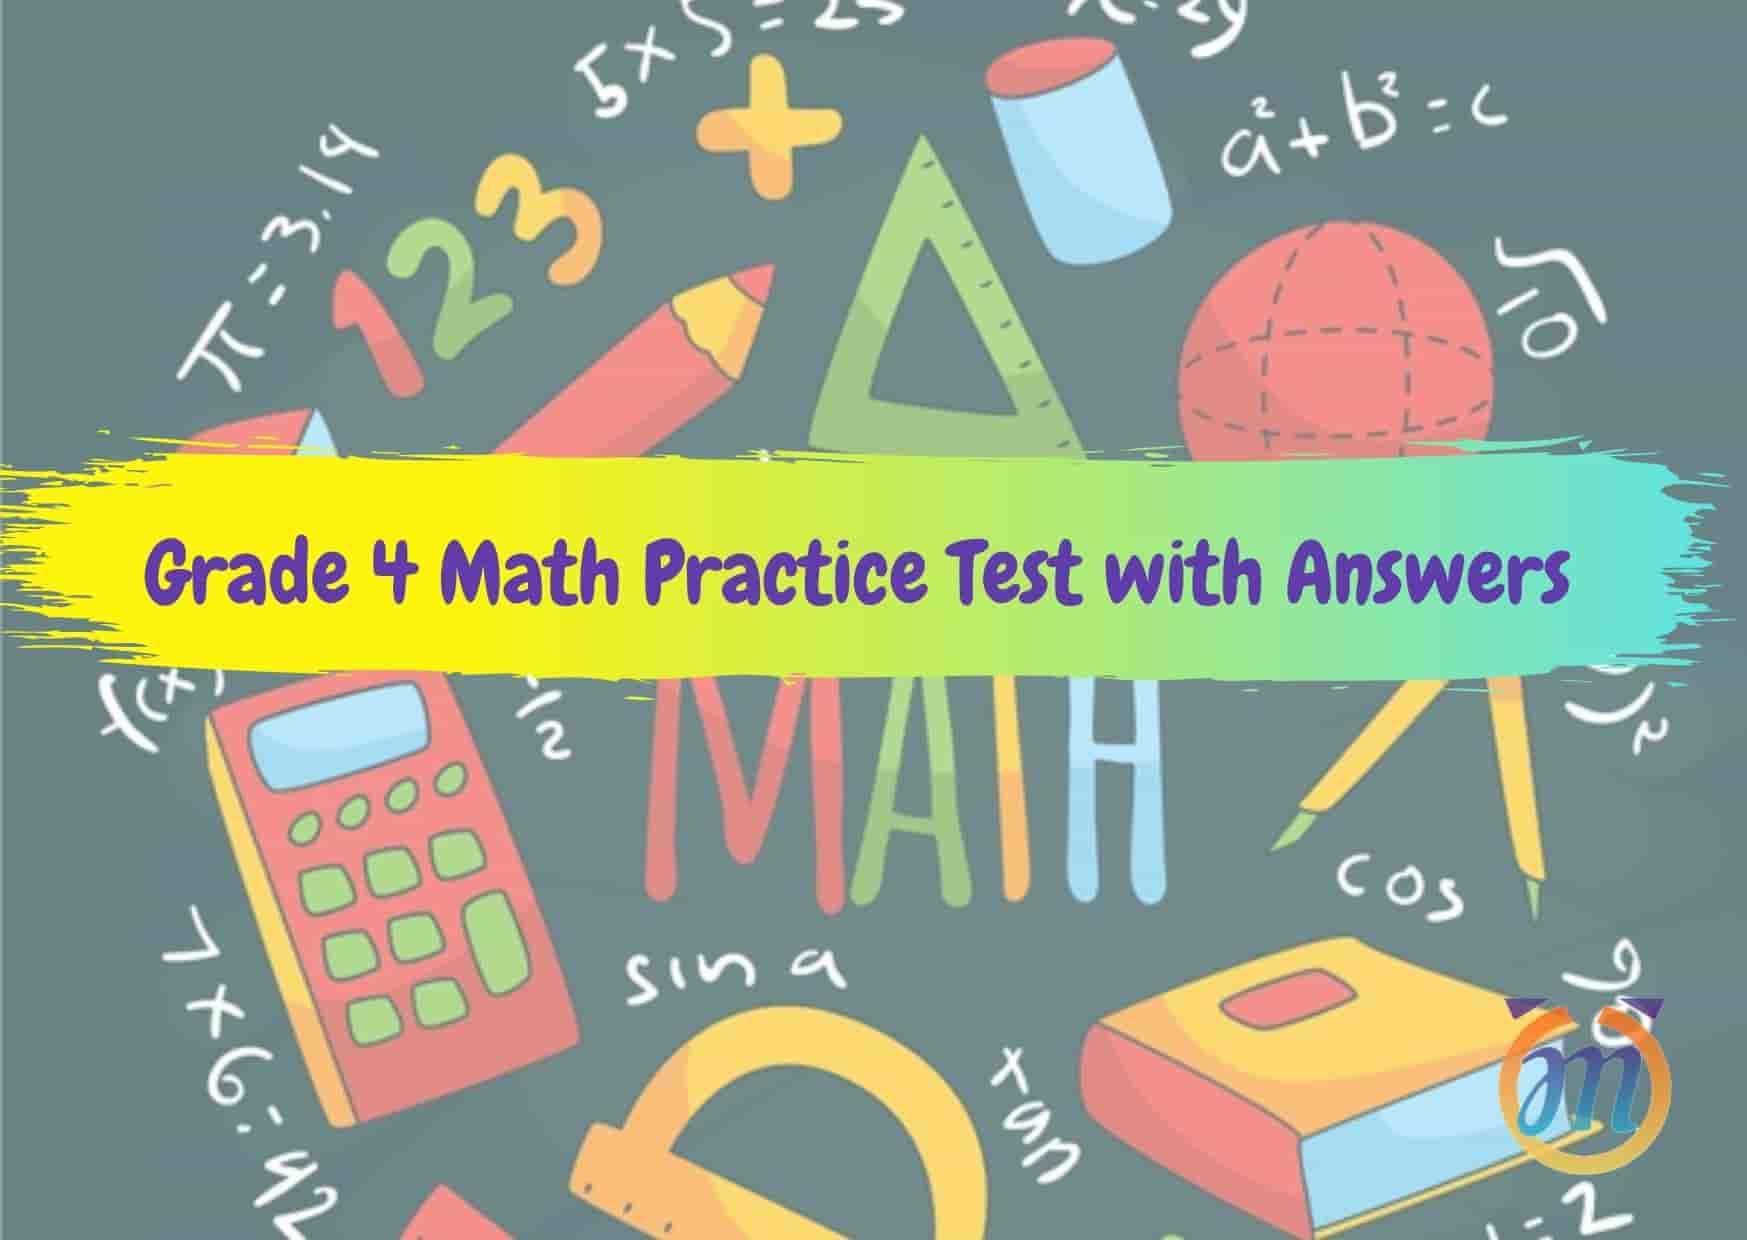 Math Quiz Worksheets For Grade 4 2